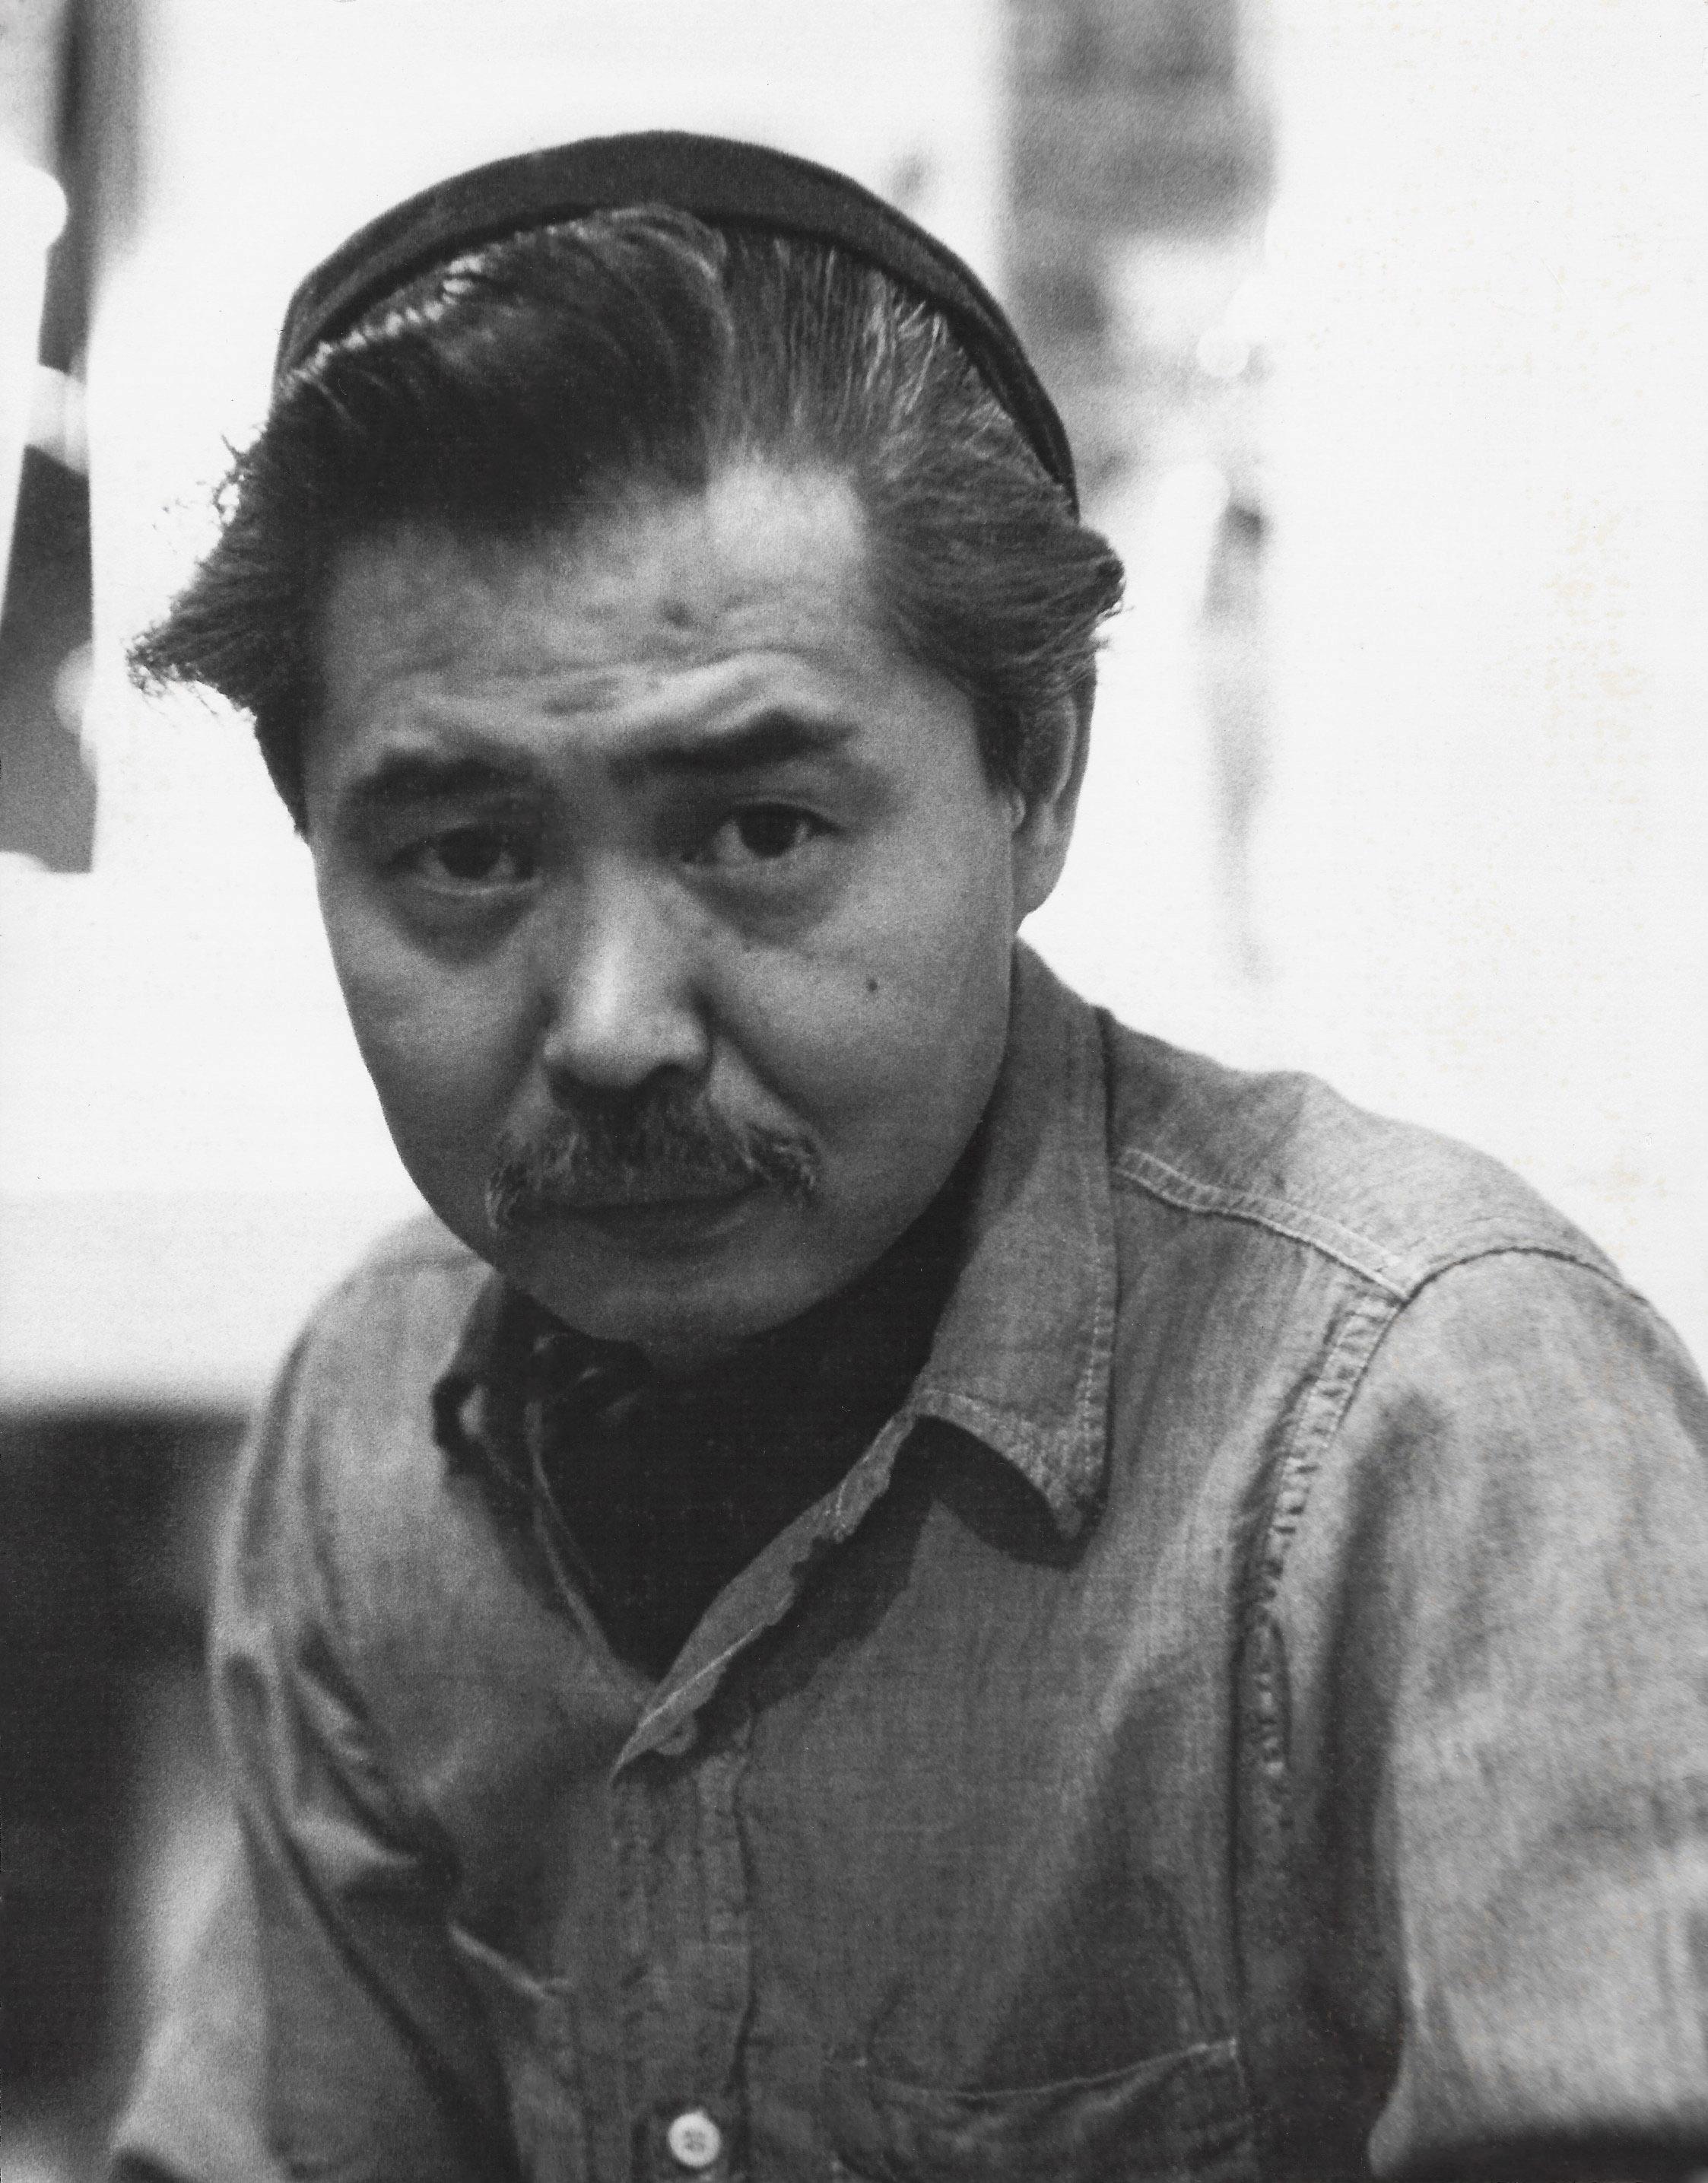 Kanemitsu in New York, 1956.